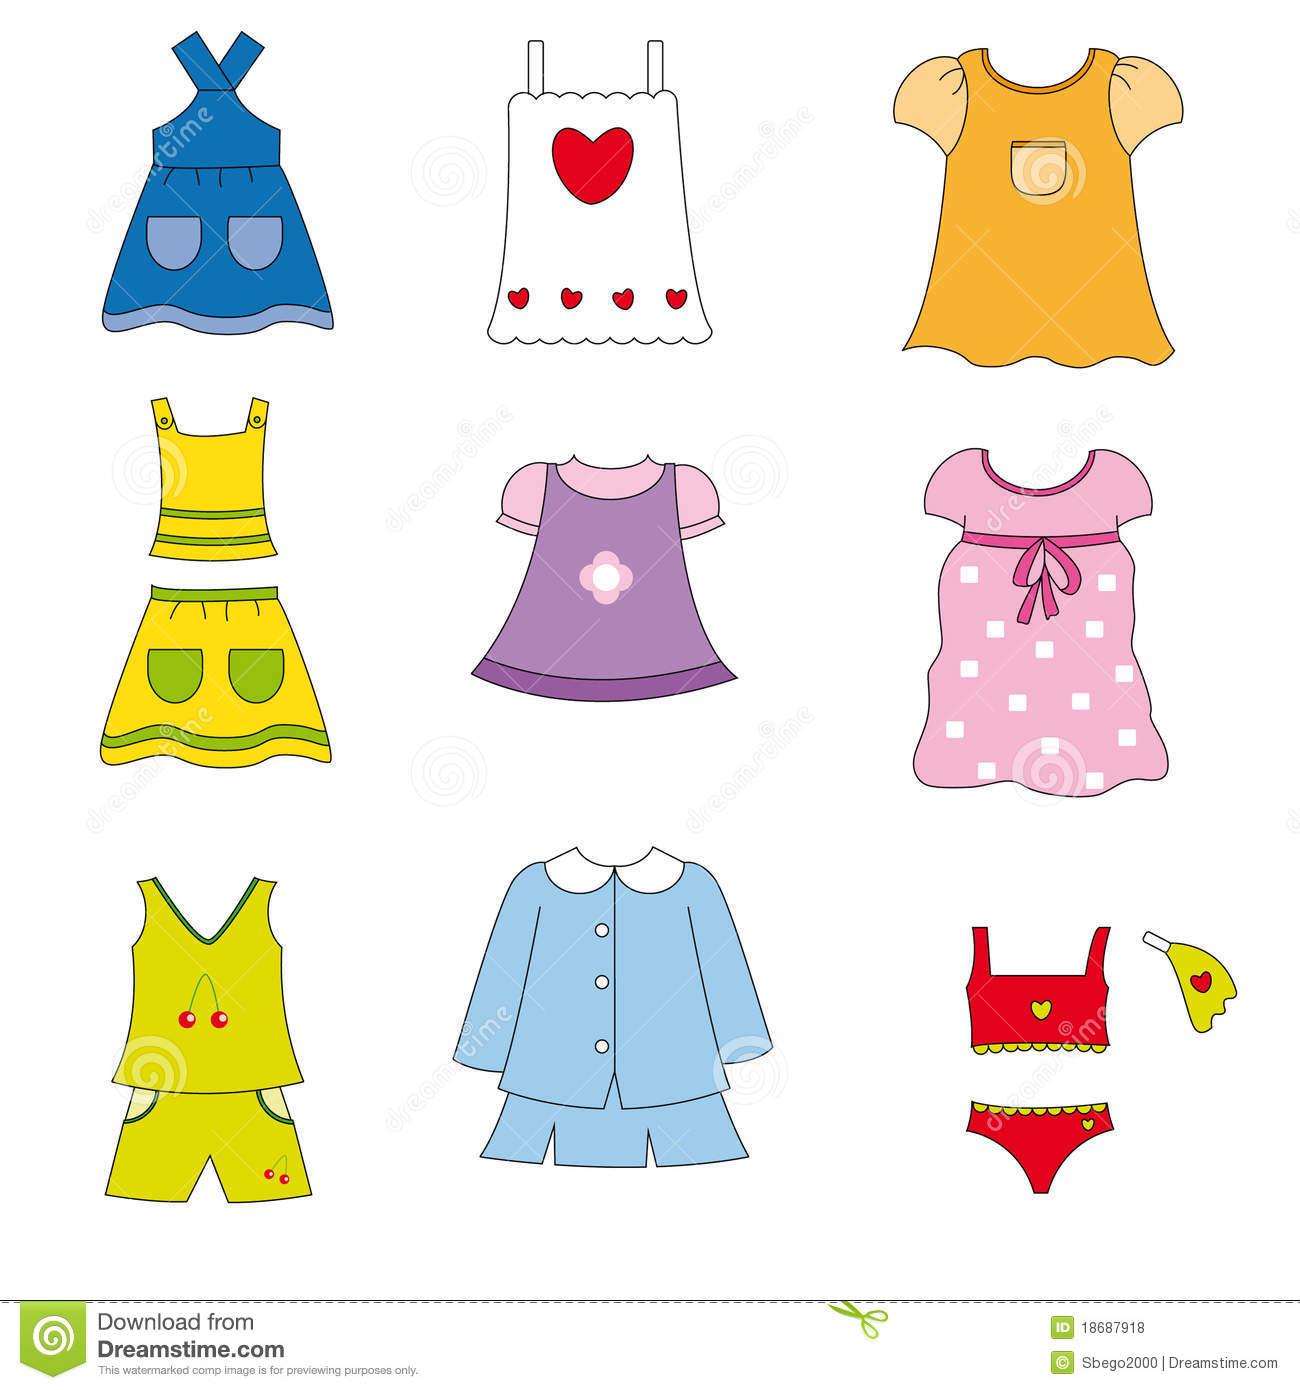 Yellow Dress clipart summer dress Teachers Clipart for clothing Free